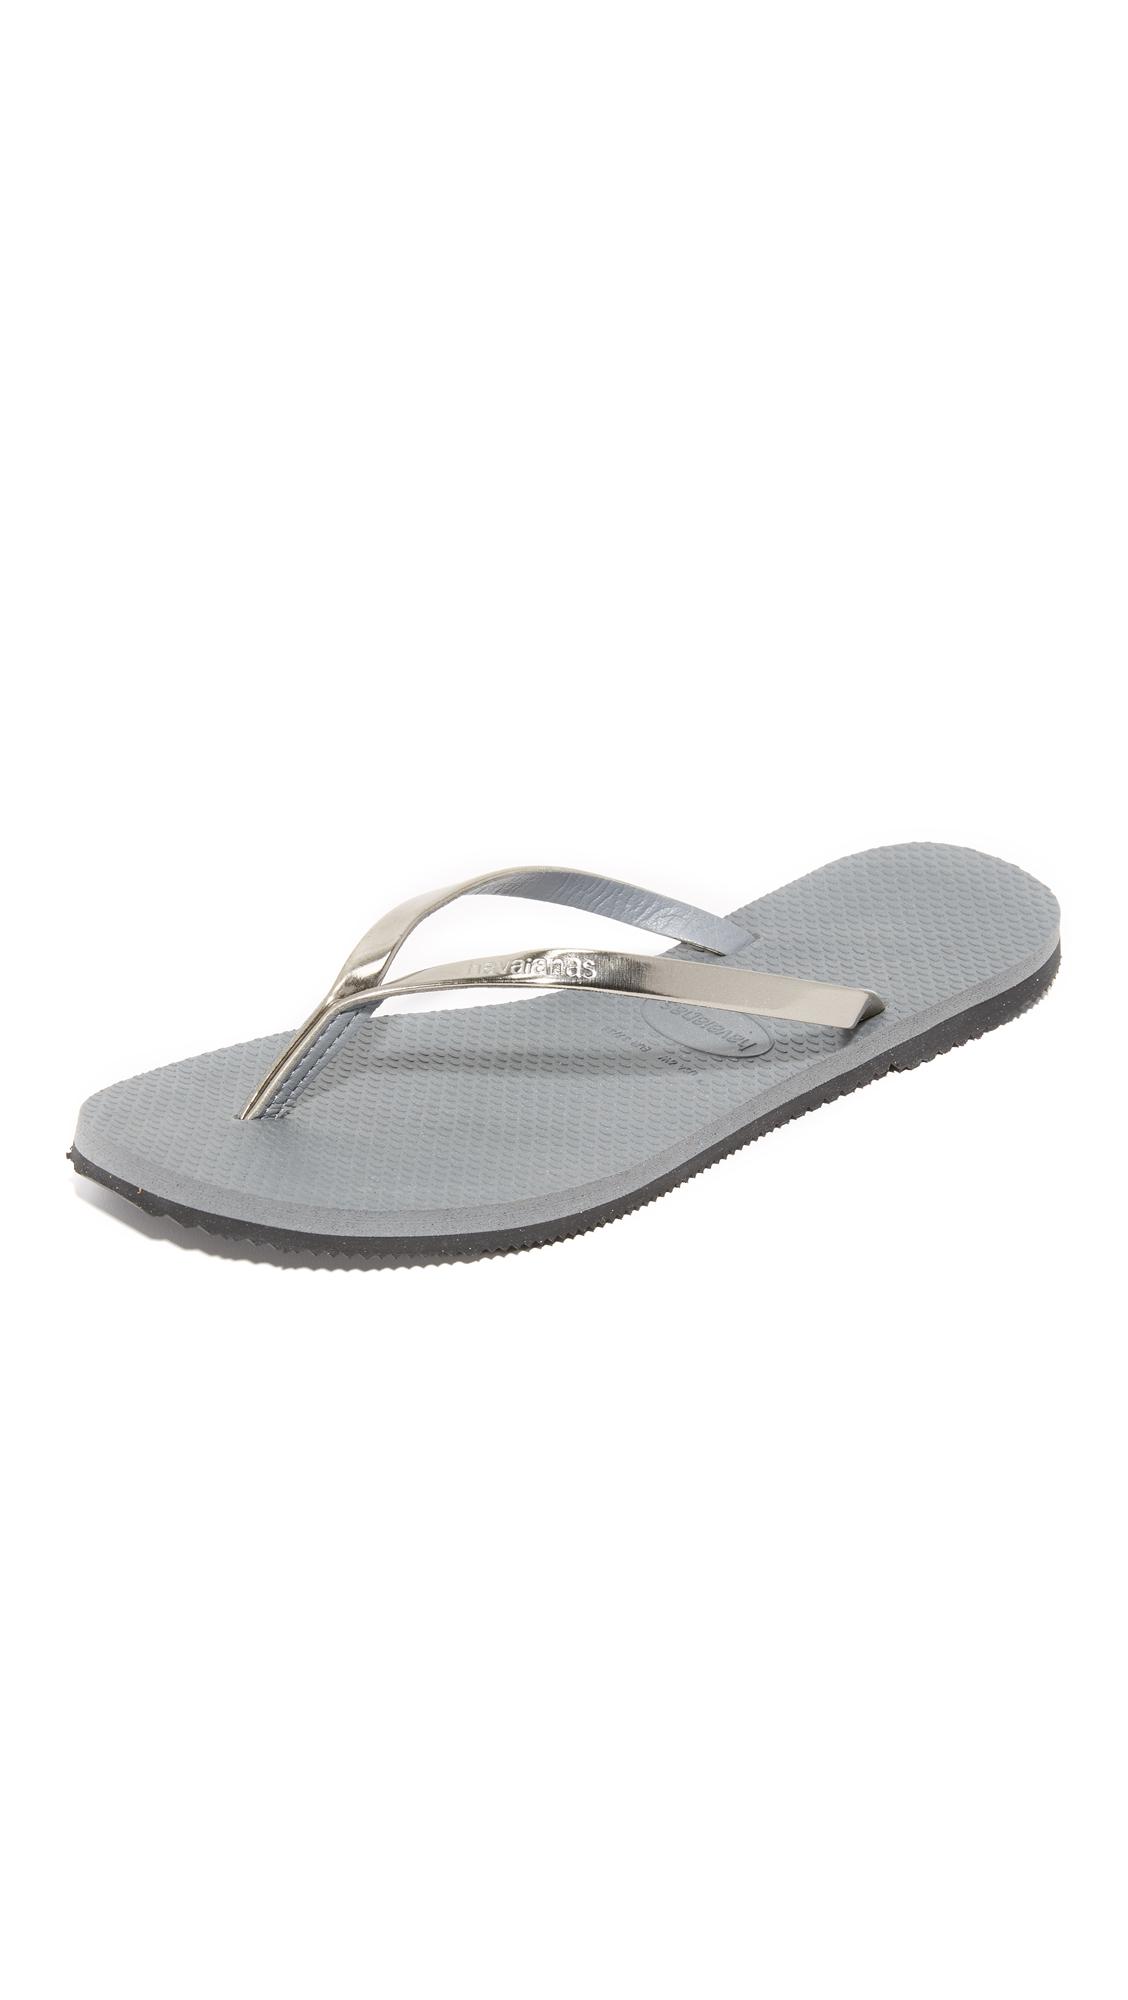 Havaianas You Metallic Flip Flops - Steel Grey at Shopbop